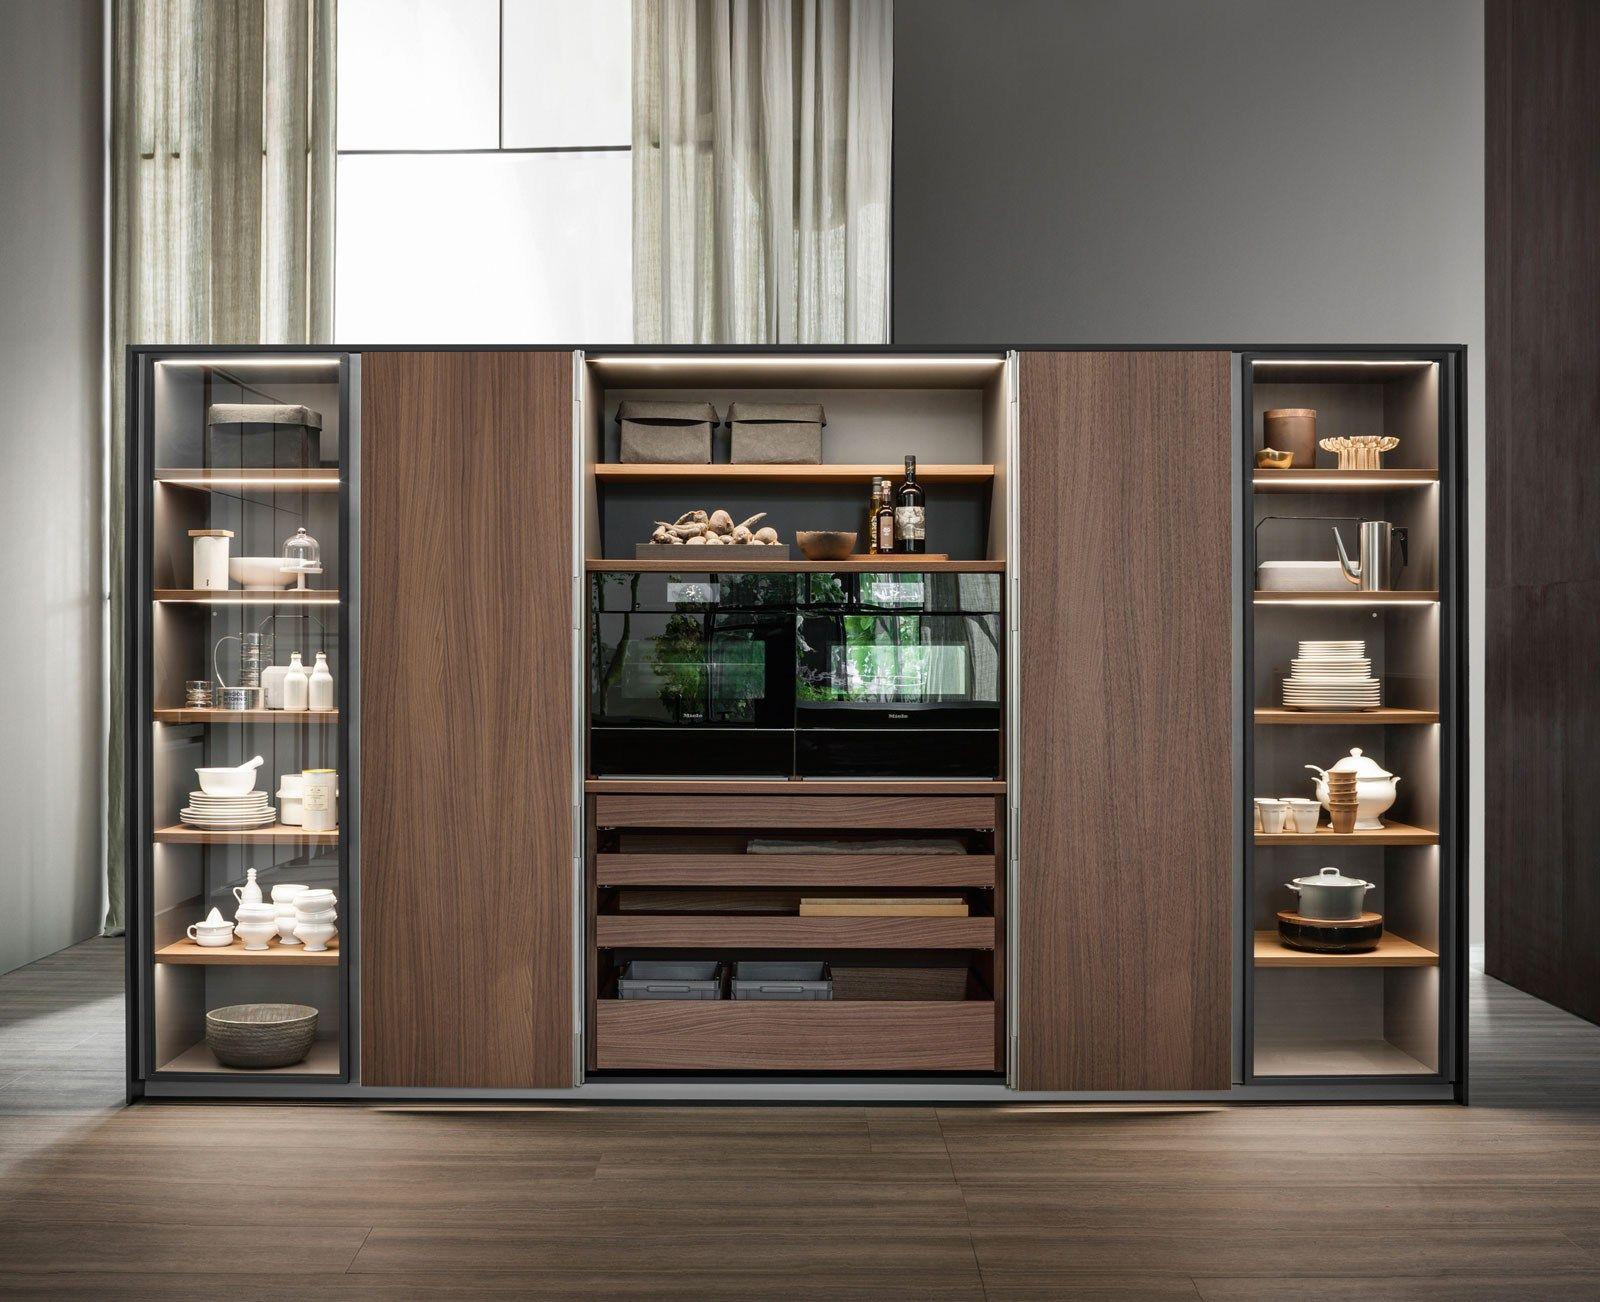 VVD-Kitchen-DADA-244222-relcd6bf97d.jpg (1600×1302)   Pantry ...